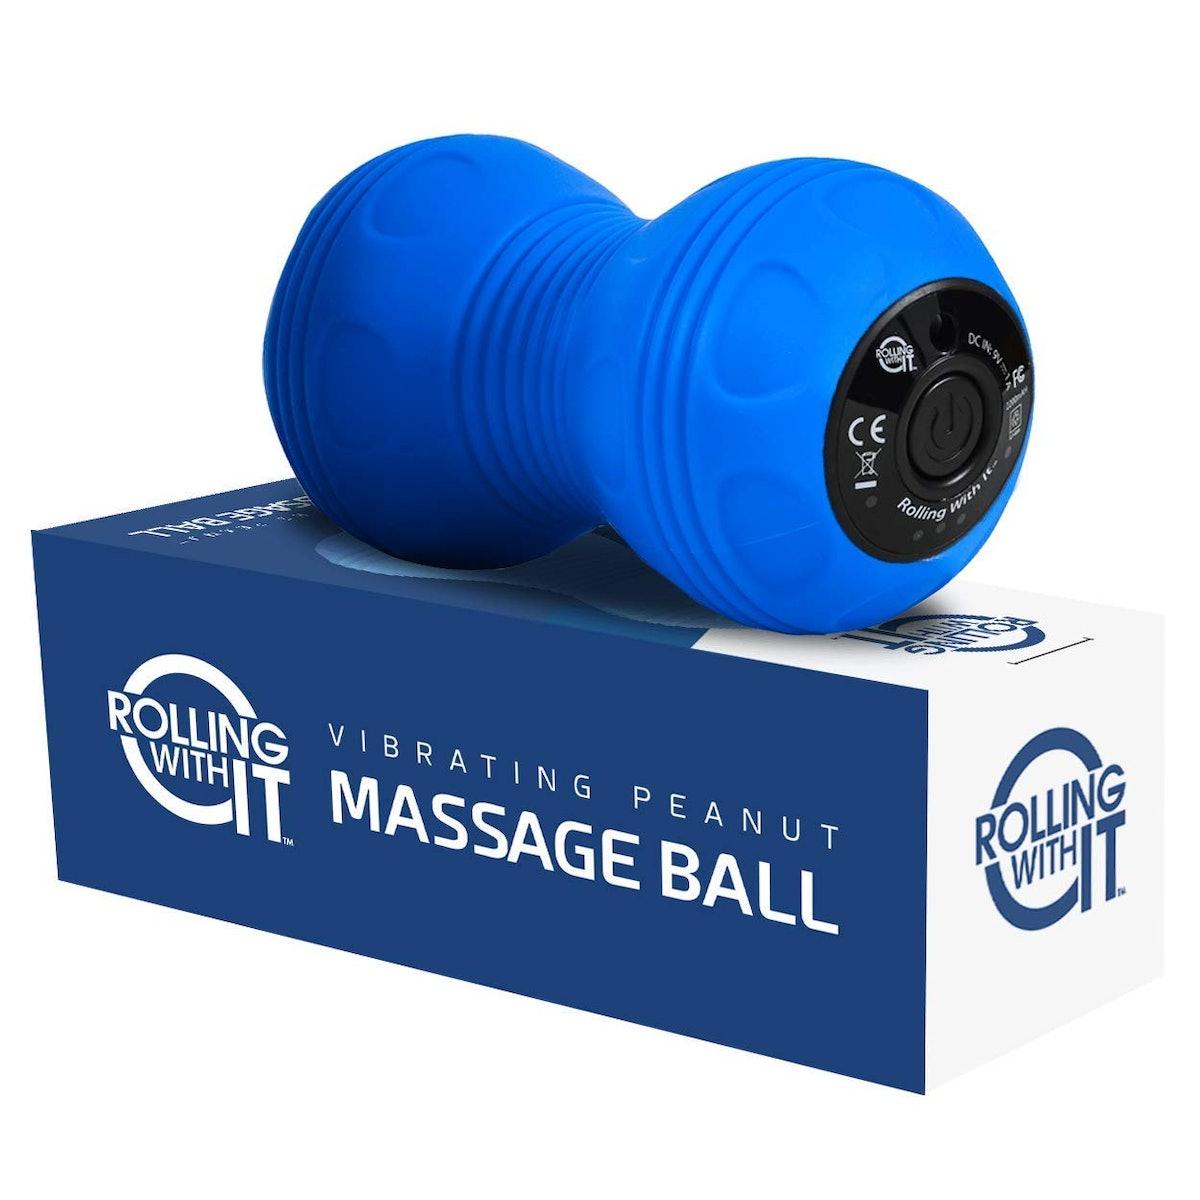 Rolling With It Vibrating Massage Peanut